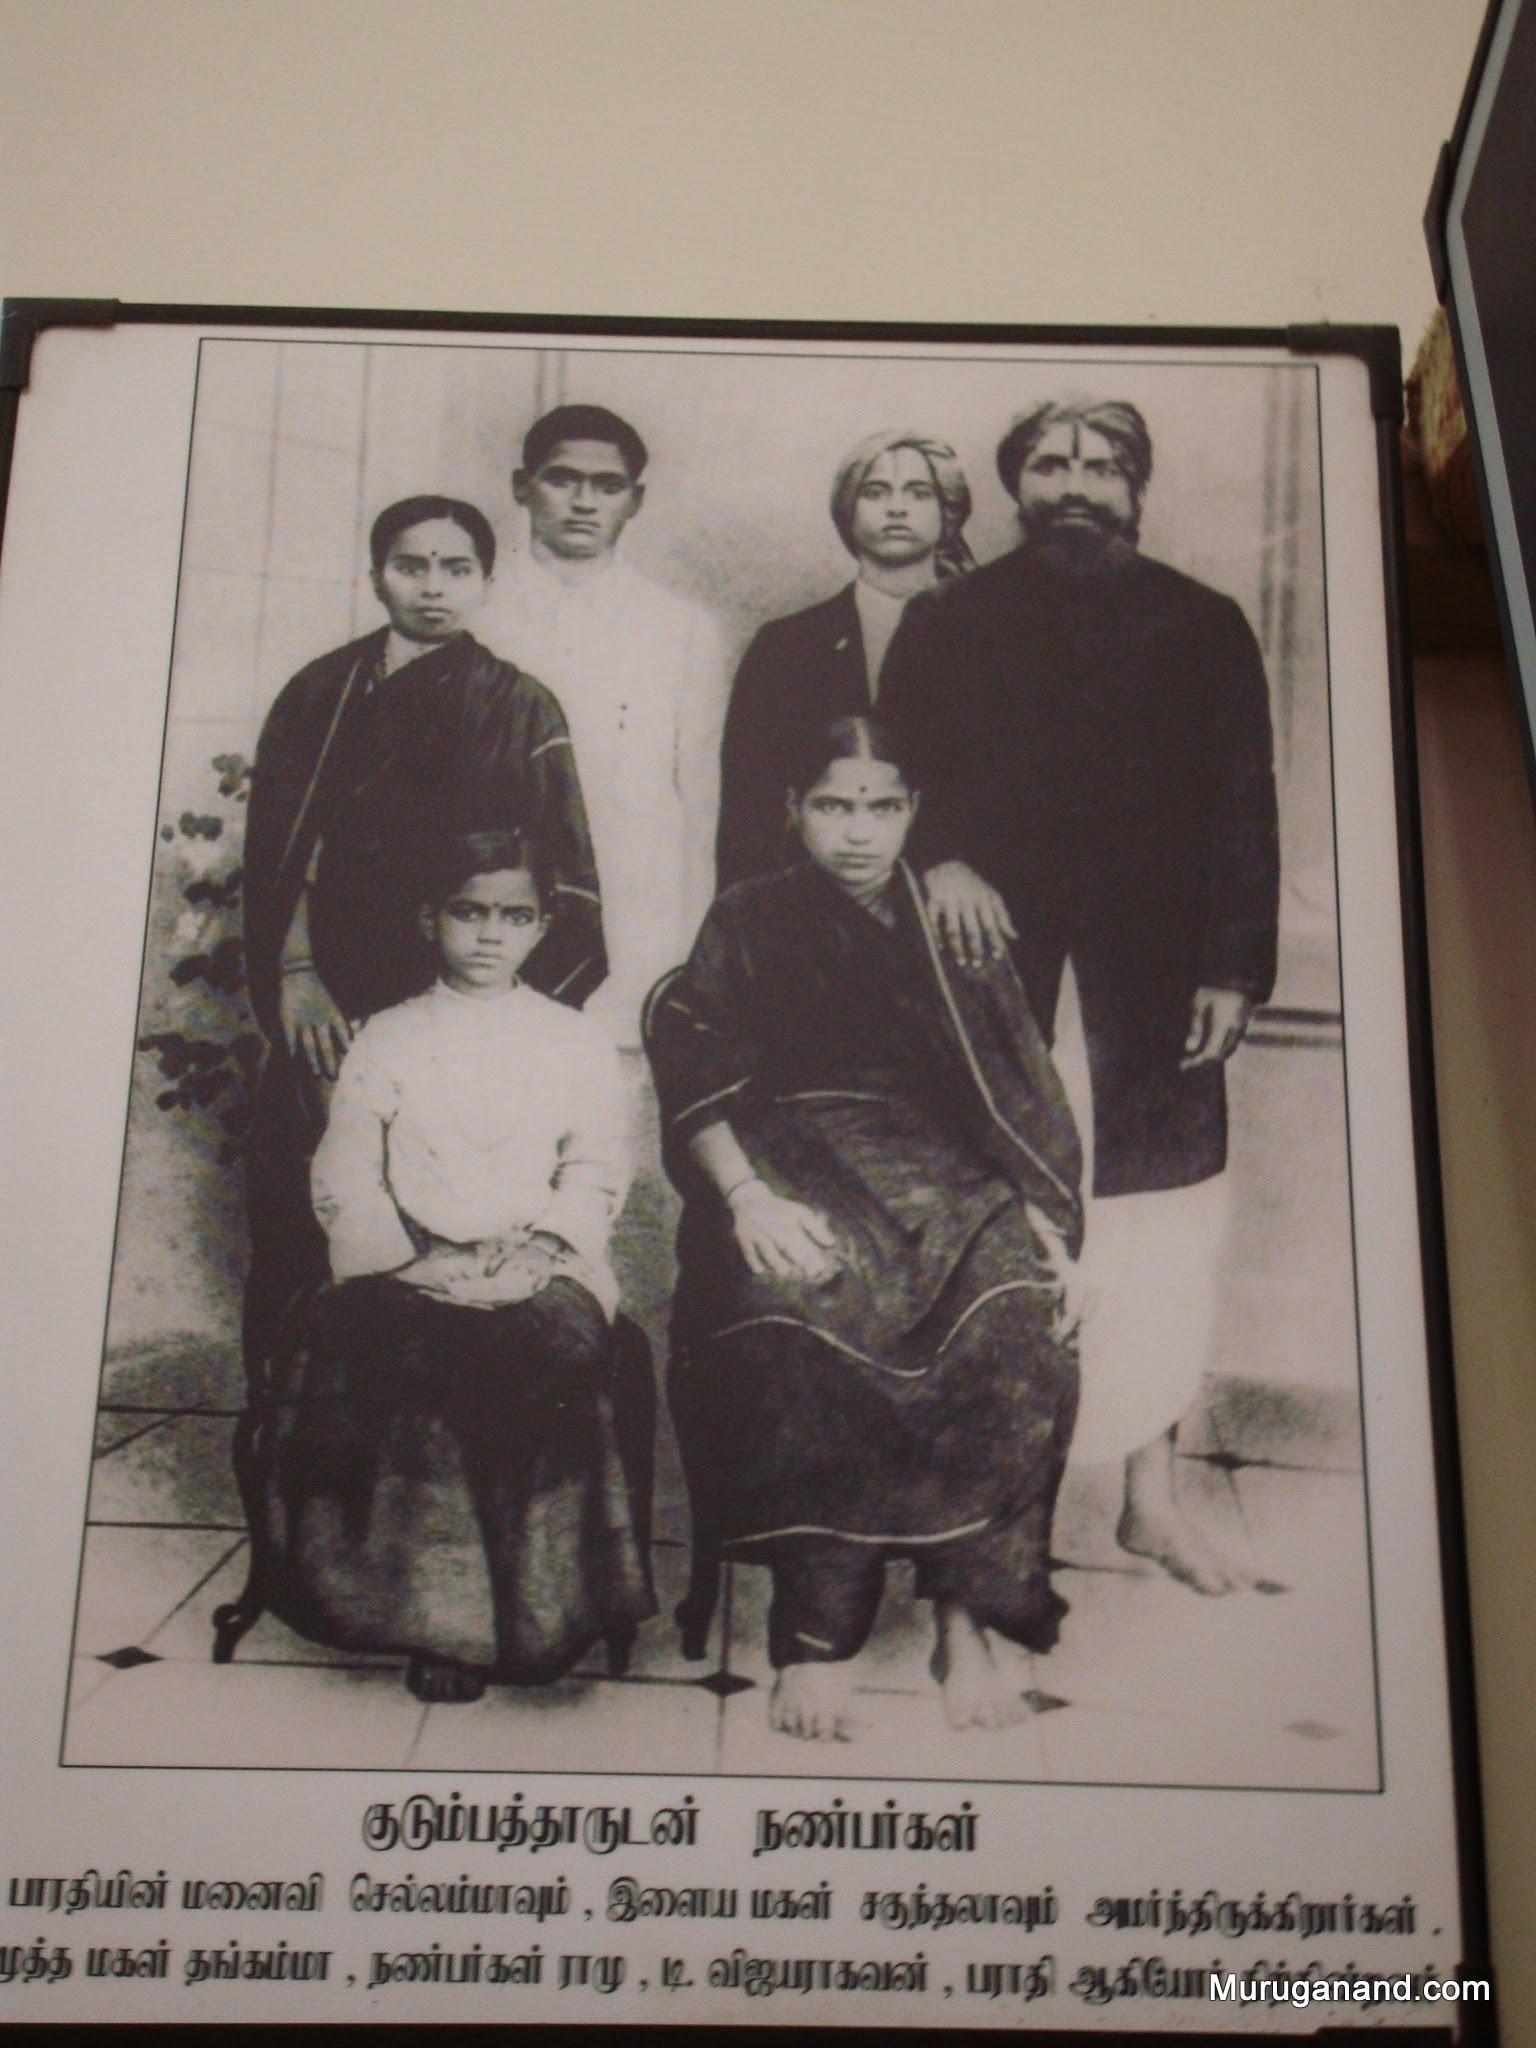 Bharati wrote poems on Chellamma, Thangammal and Sakunthala